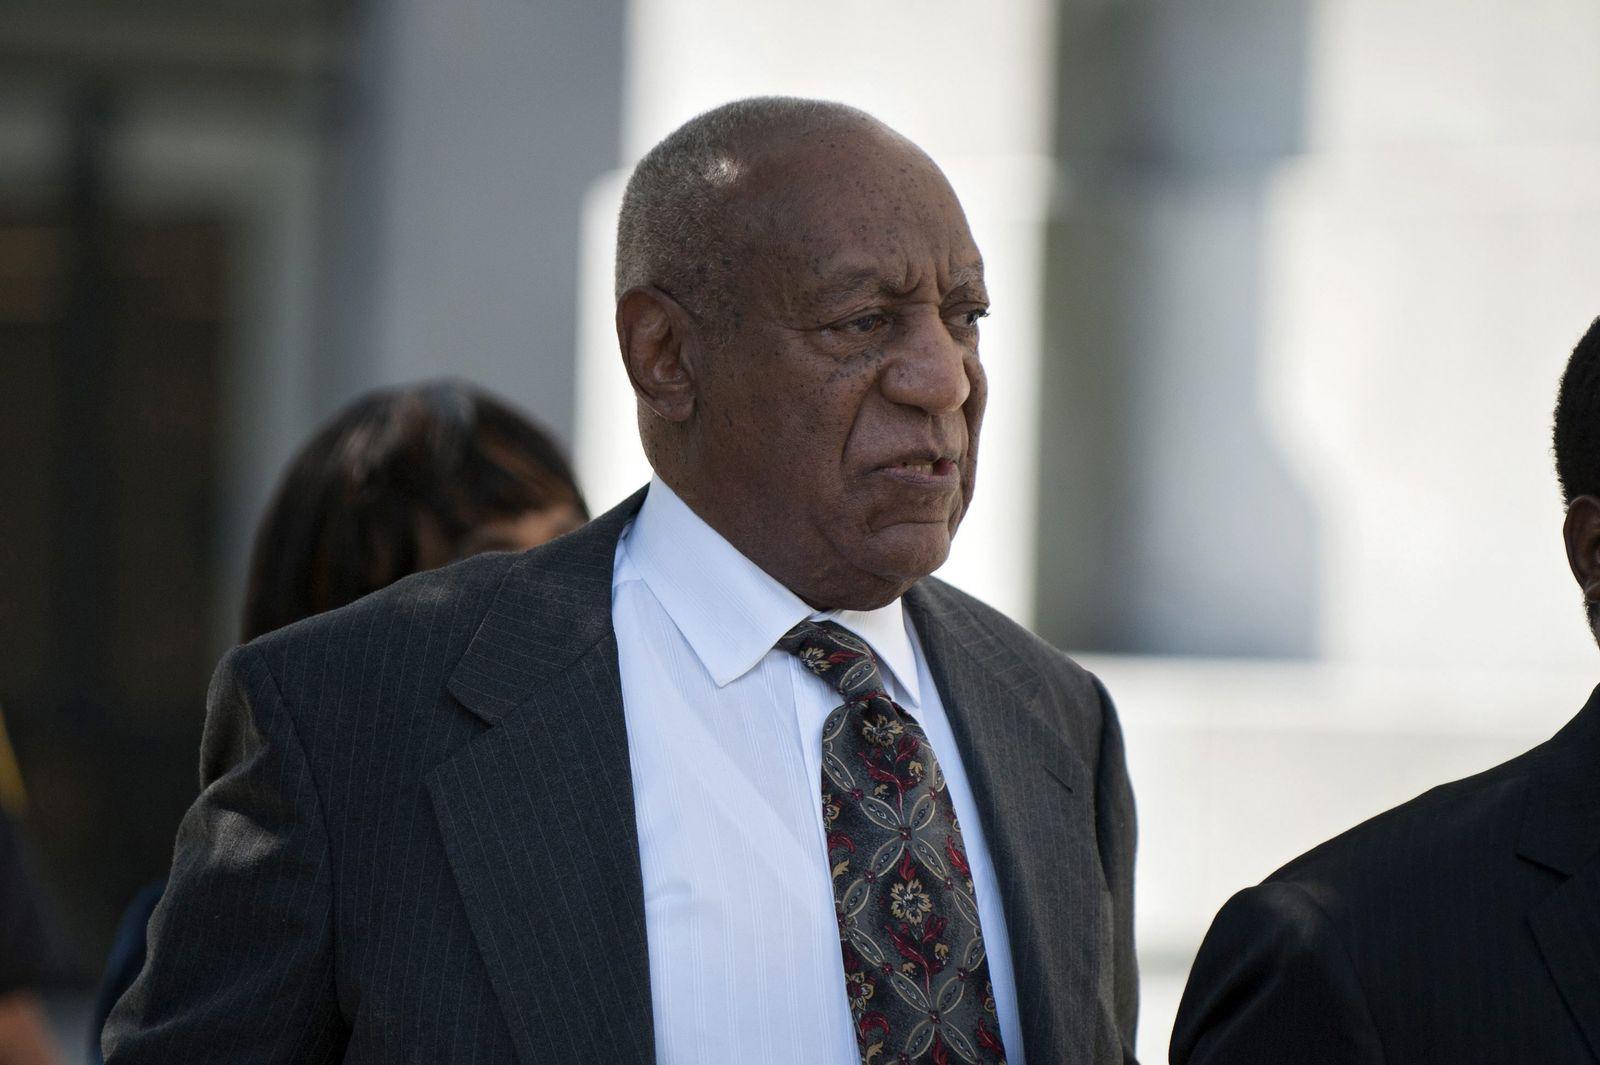 Peliminary hearing against Bill Cosby in Pennsylvania